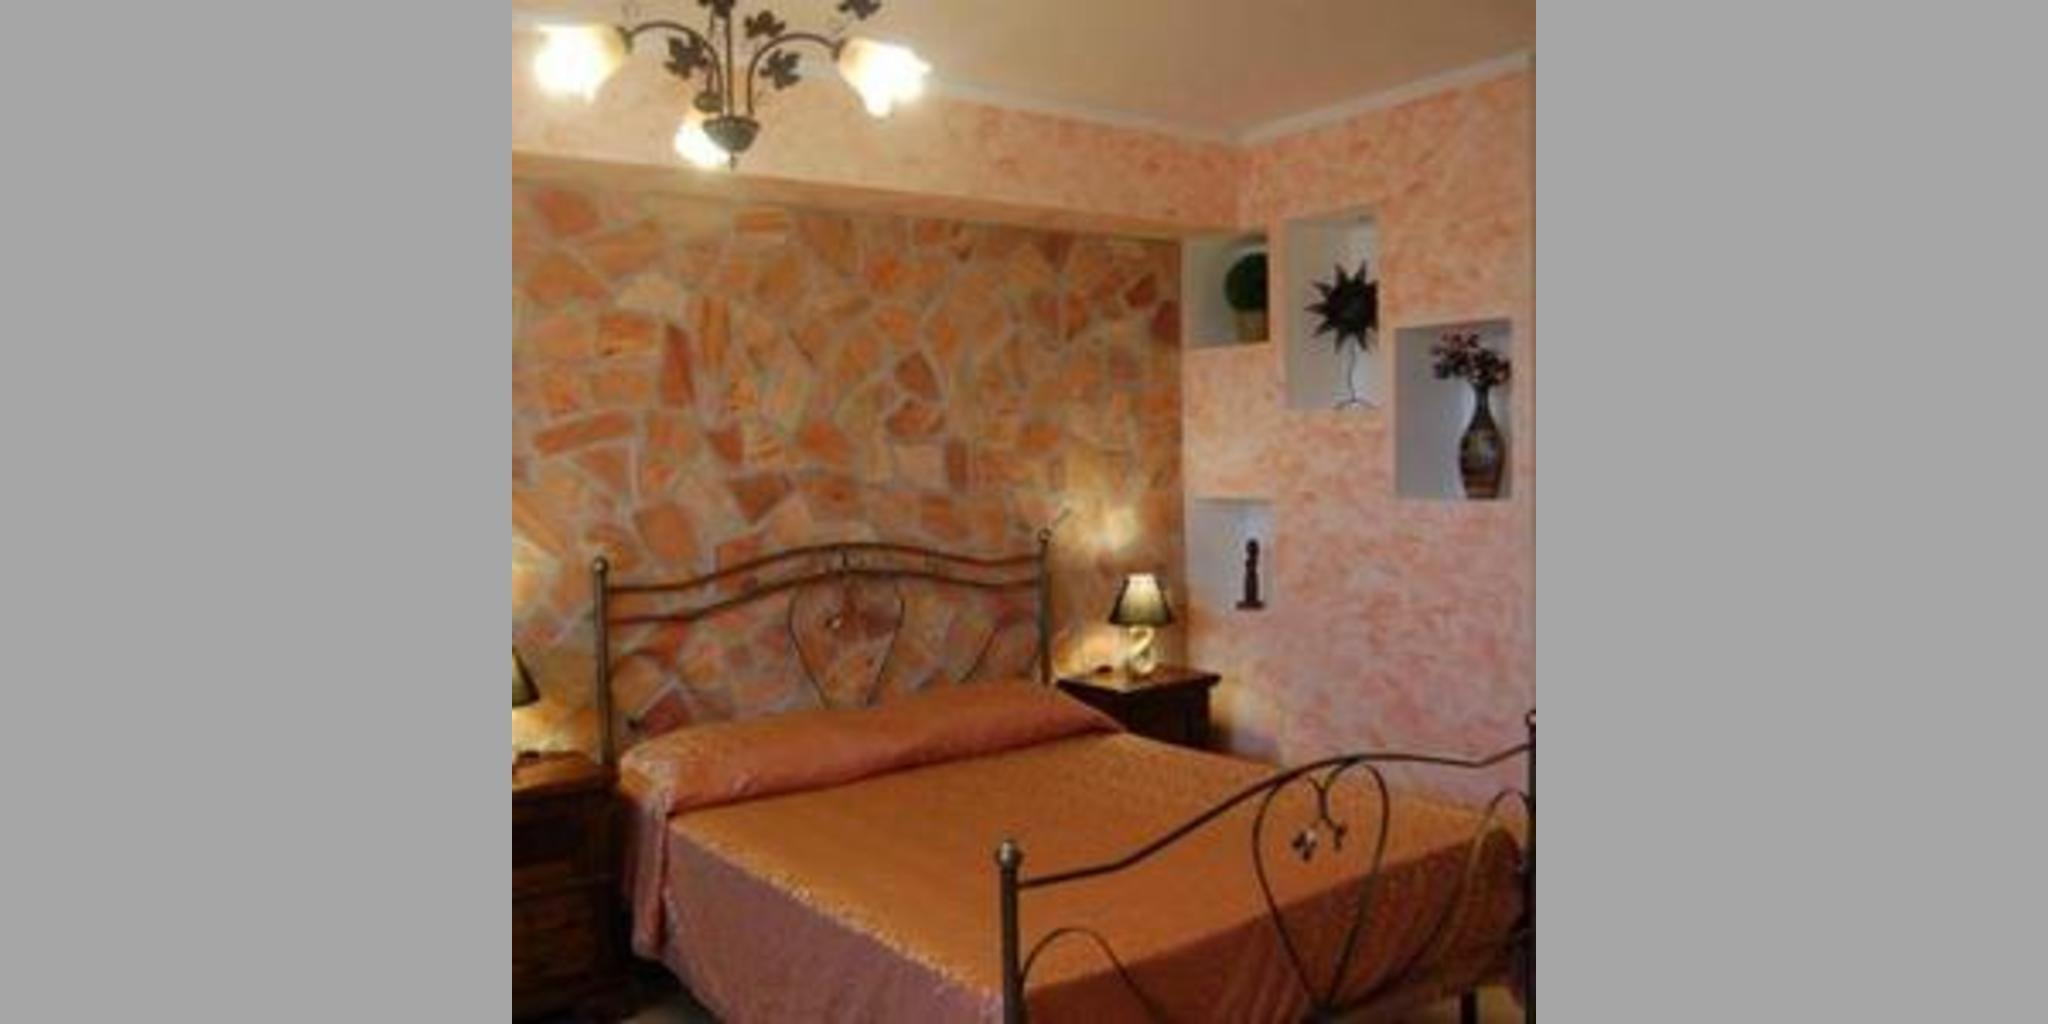 Bed & Breakfast Valmontone - Valmontone